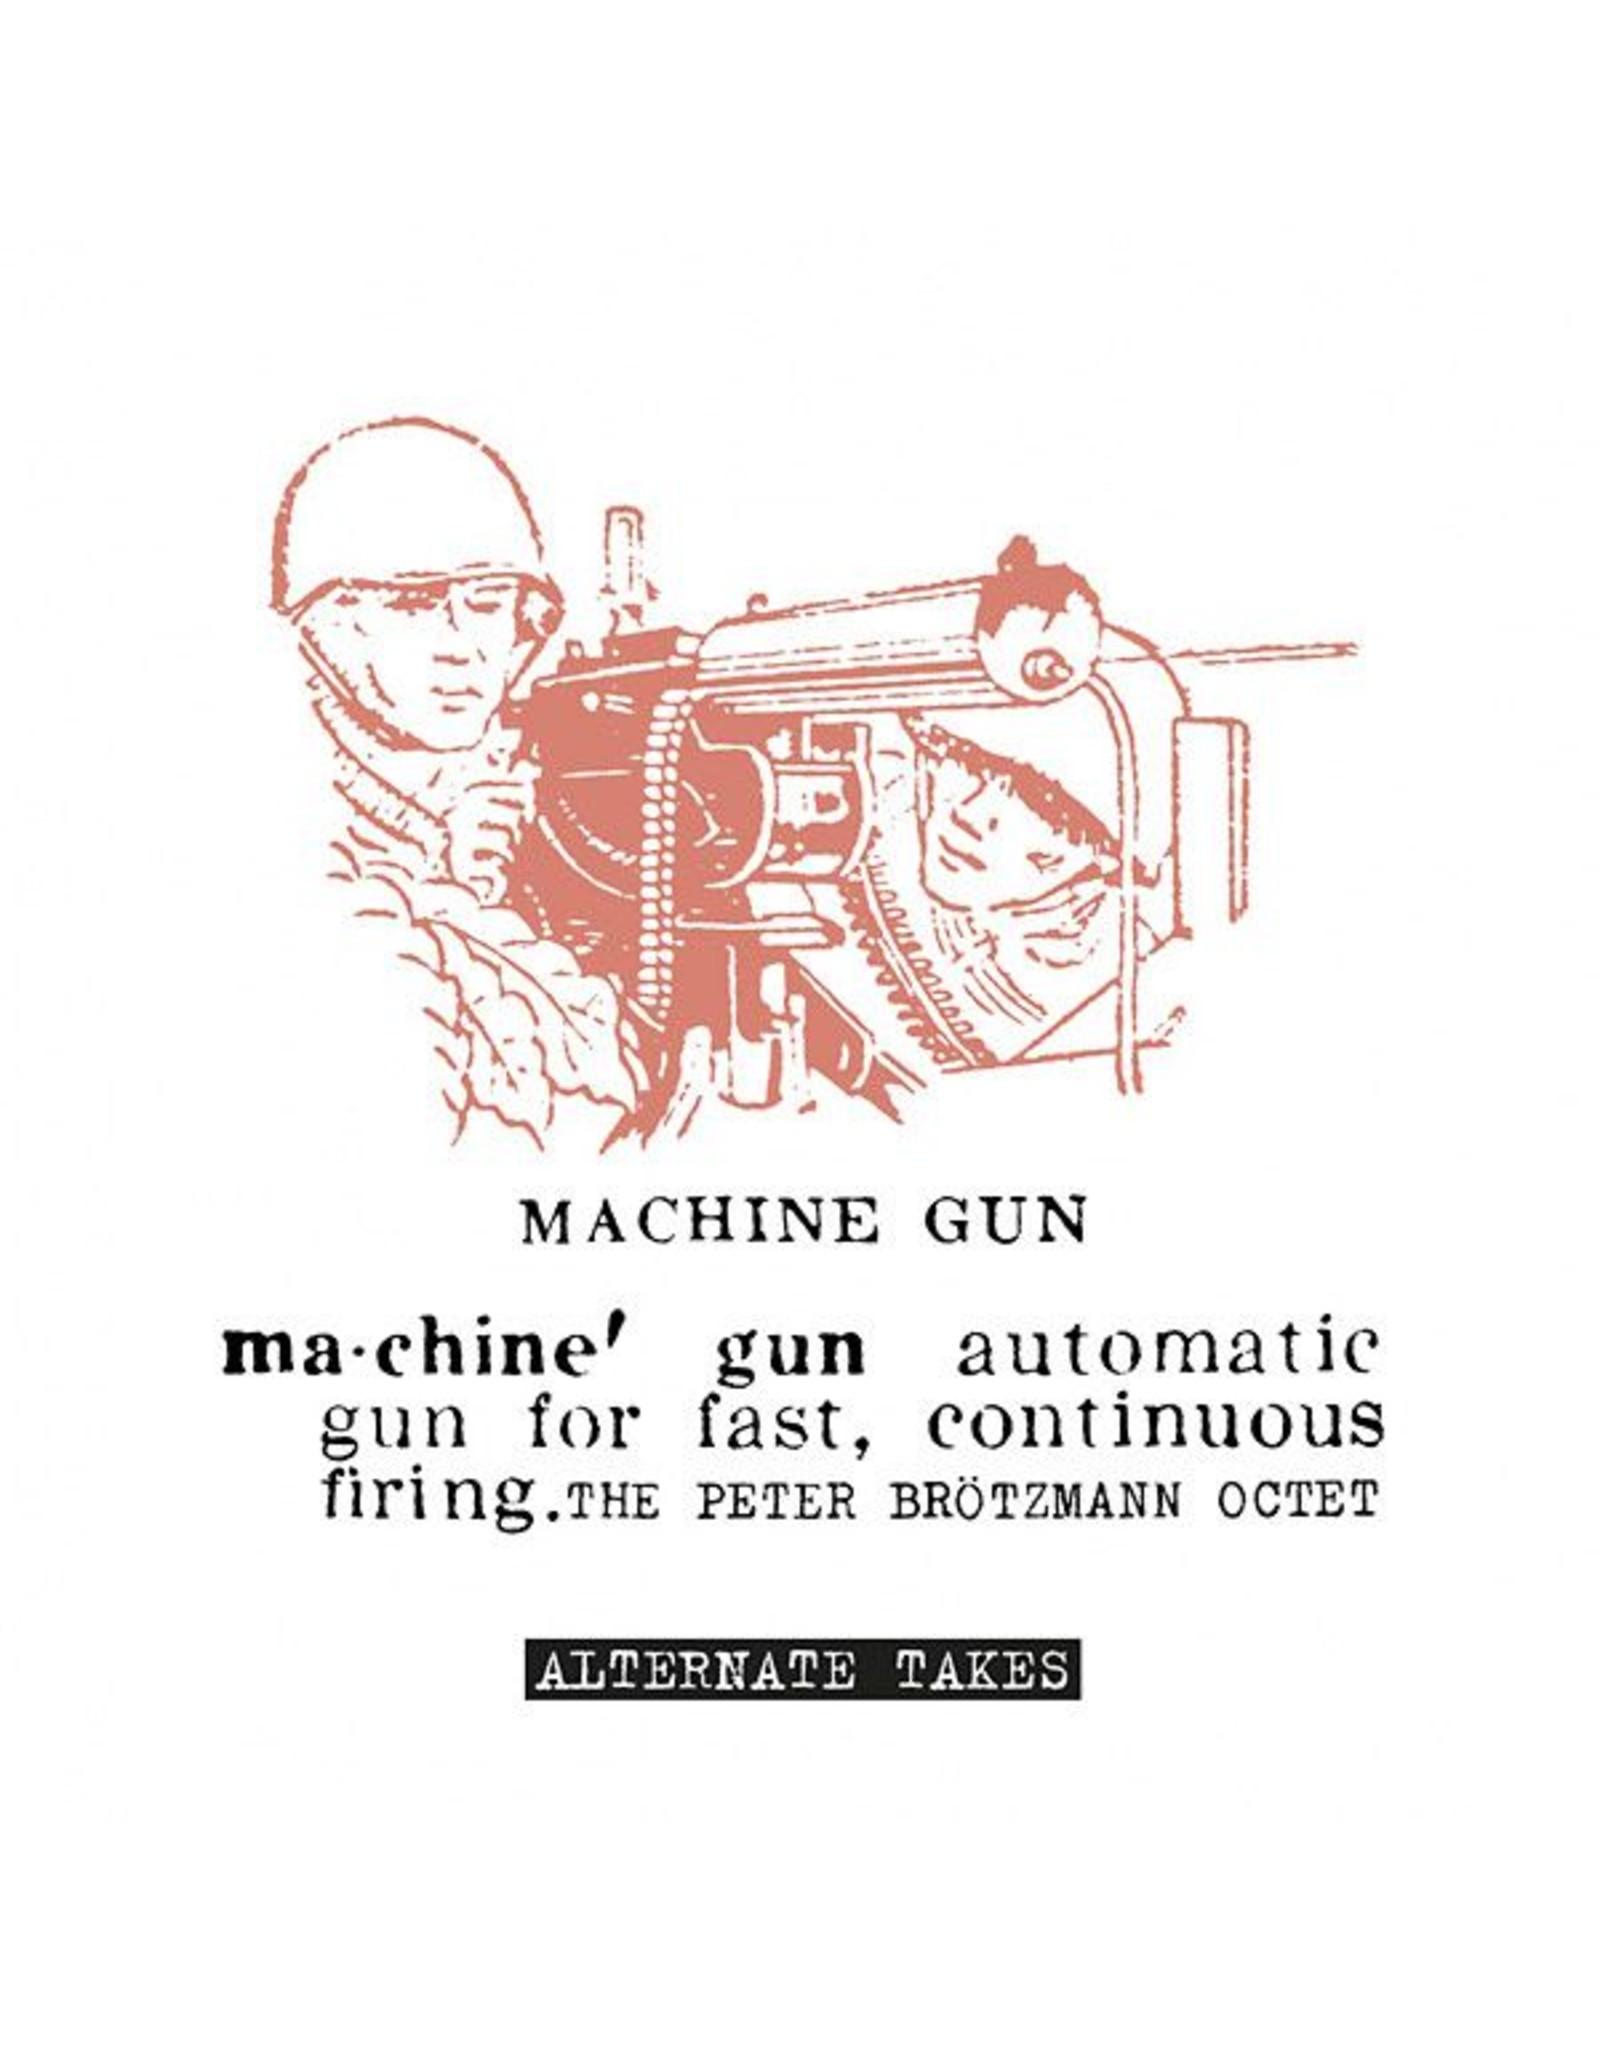 Cien Fuegos Brotzmann, Peter: Machine Alternate Takes LP